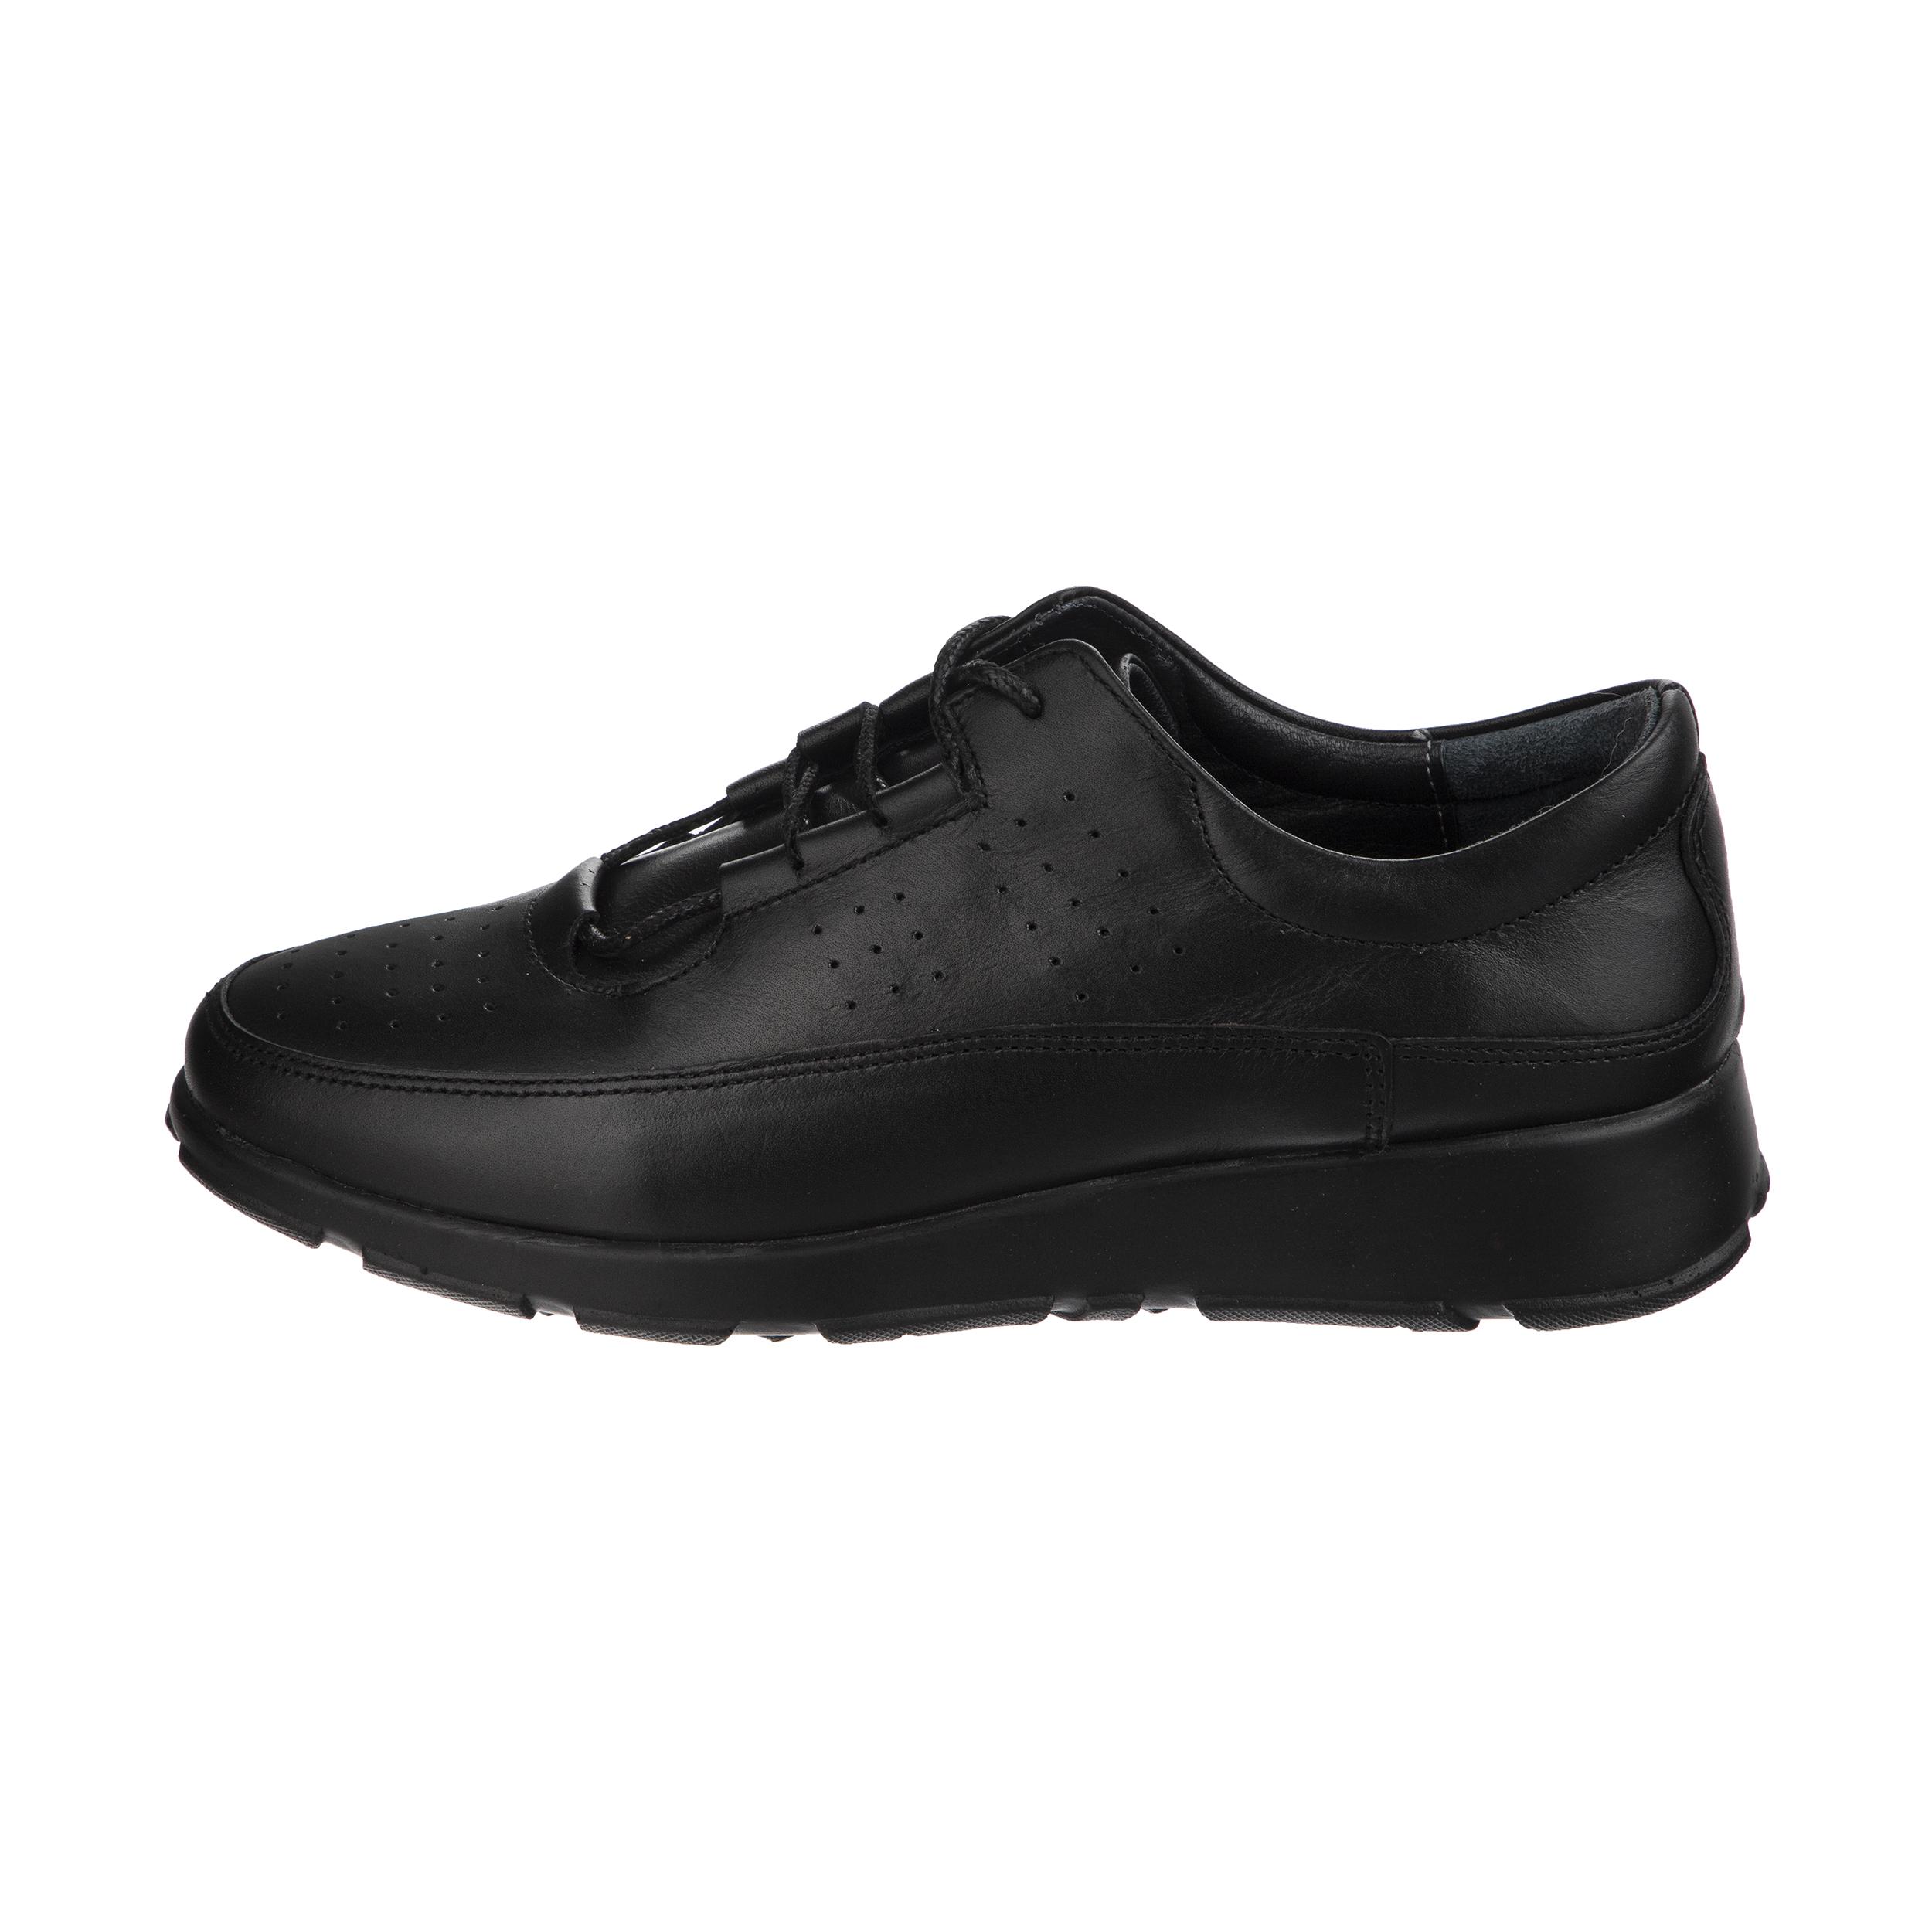 کفش روزمره زنانه شیفر مدل5289A500101